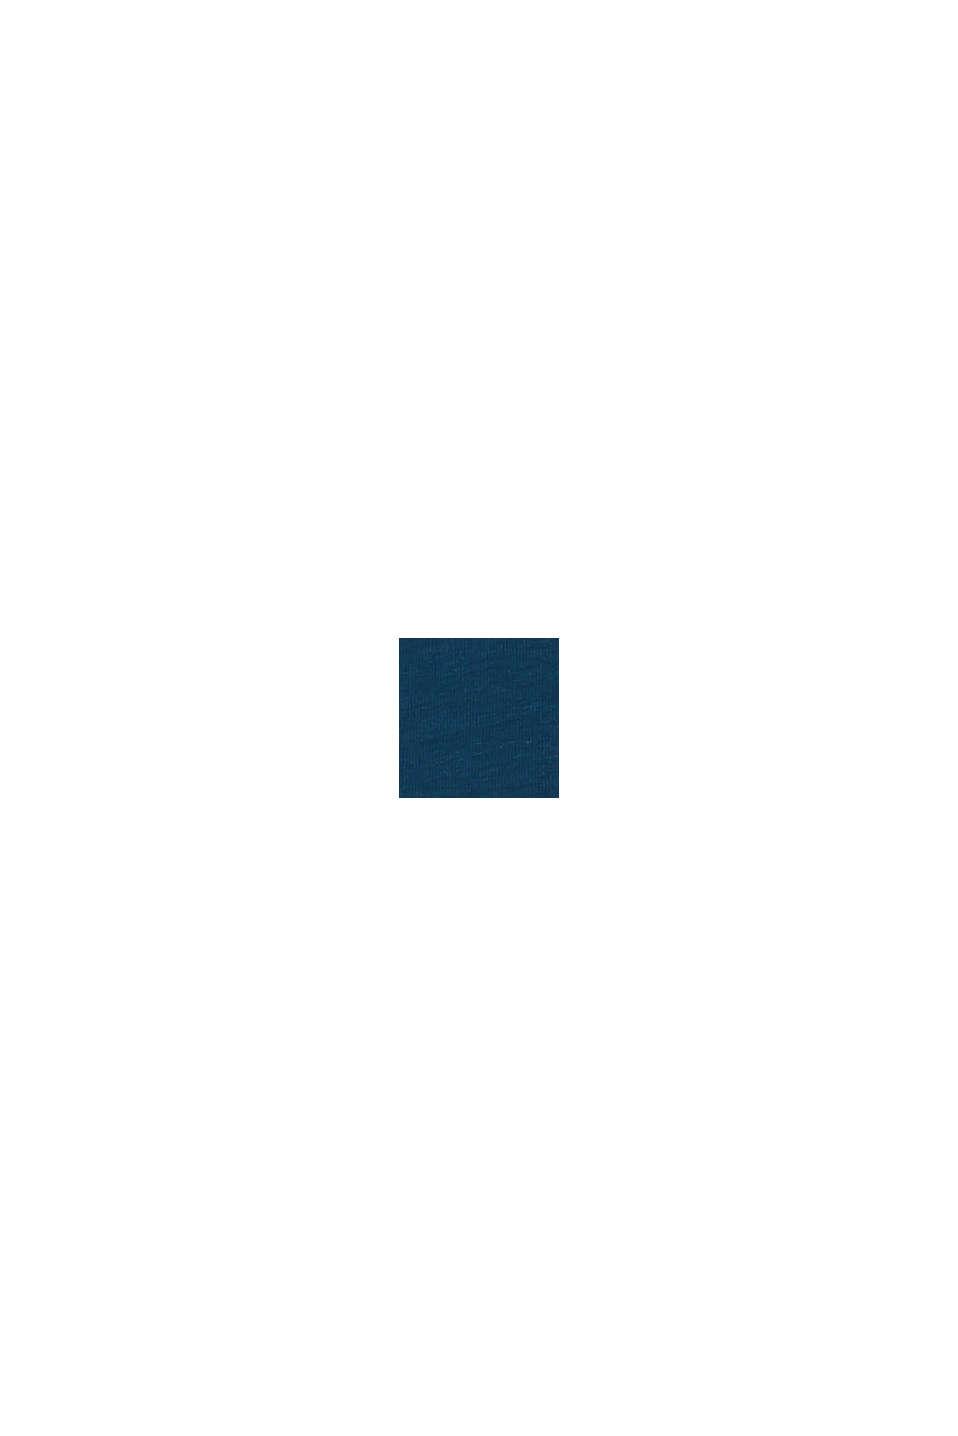 Hipstertrosa i bomullsstretch, 3-pack, PETROL BLUE, swatch